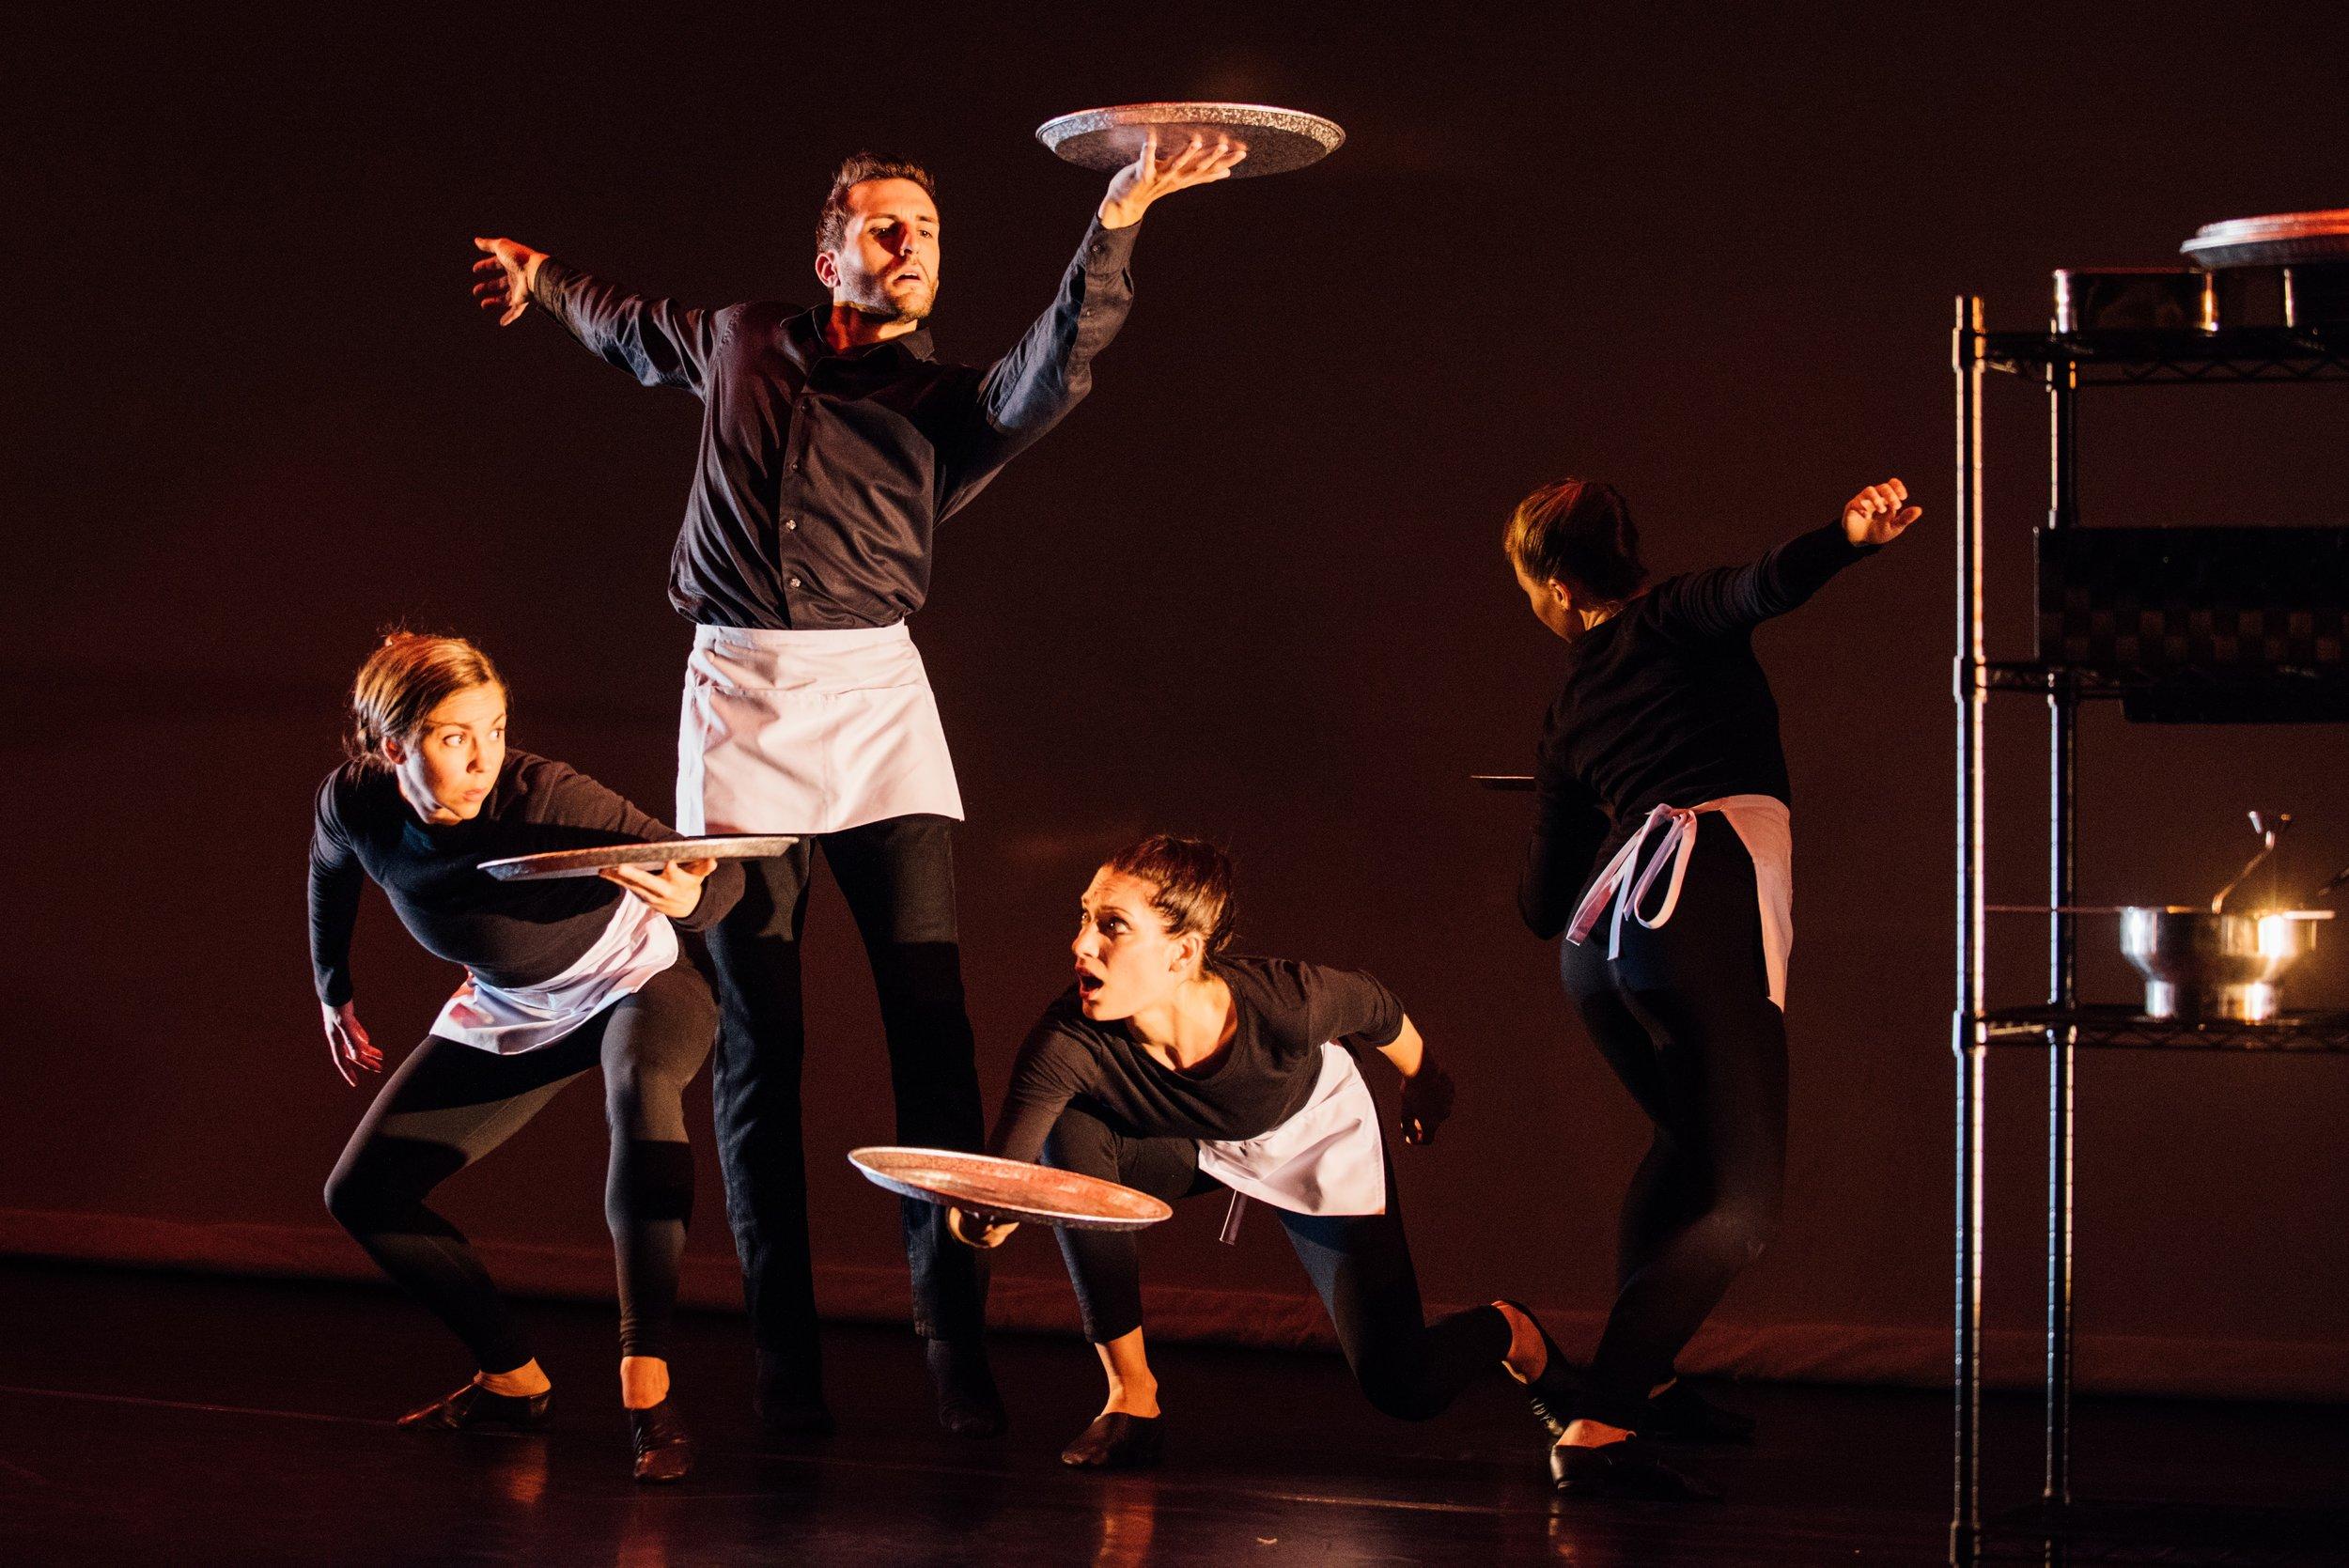 Hangry- Choreographer: Gina Hanchey - Part of STIR (2017) - photo credit Denny Culbert